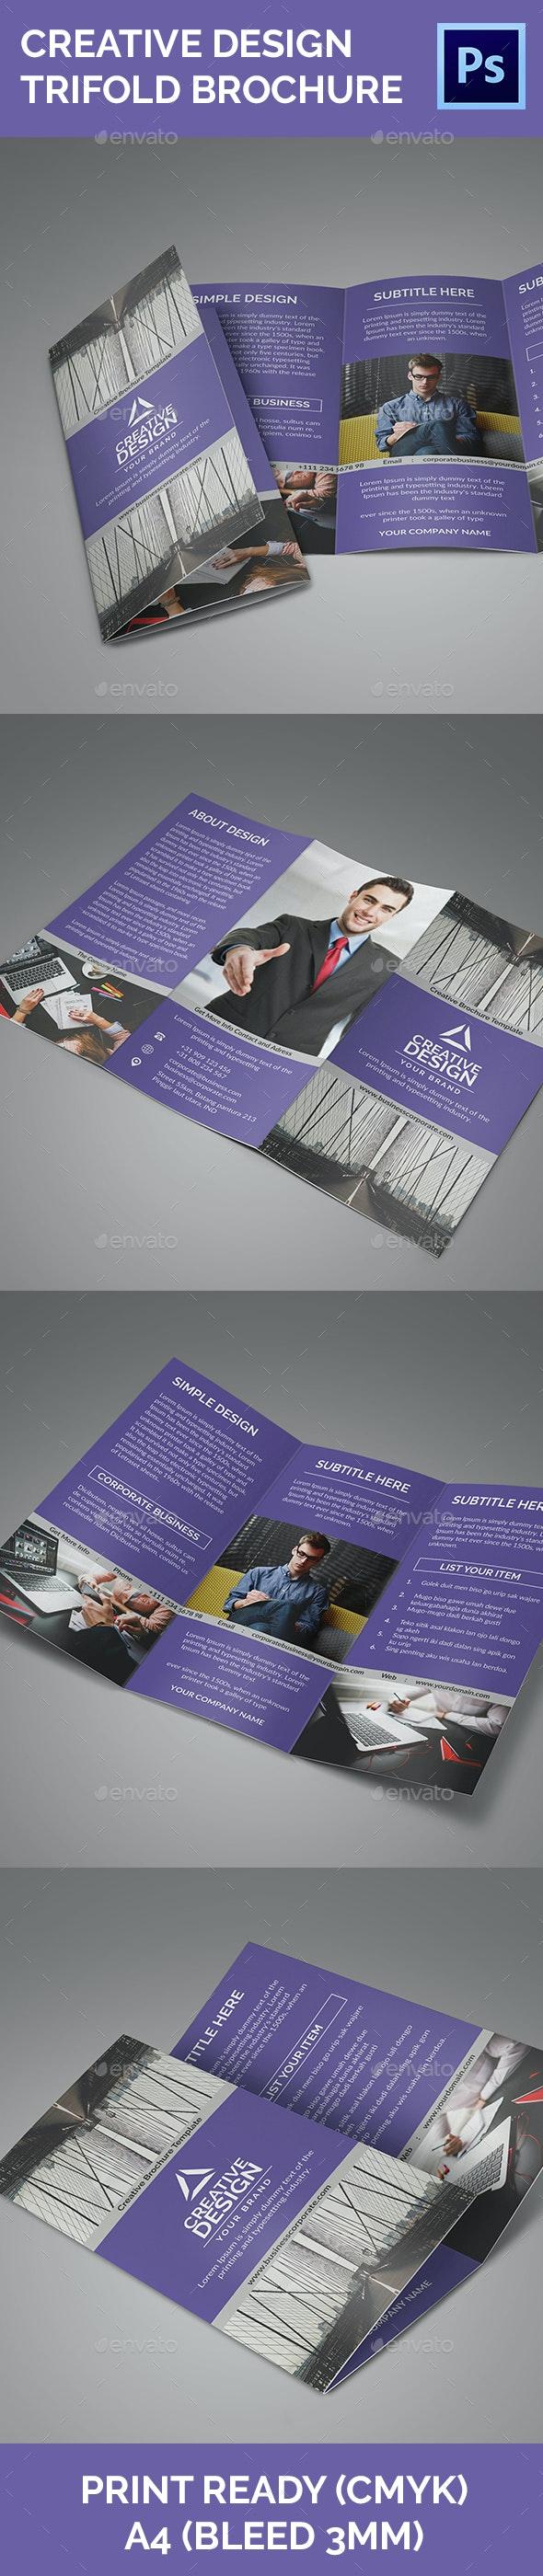 Creative Design Vol 2 Trifold Brochure - Corporate Brochures